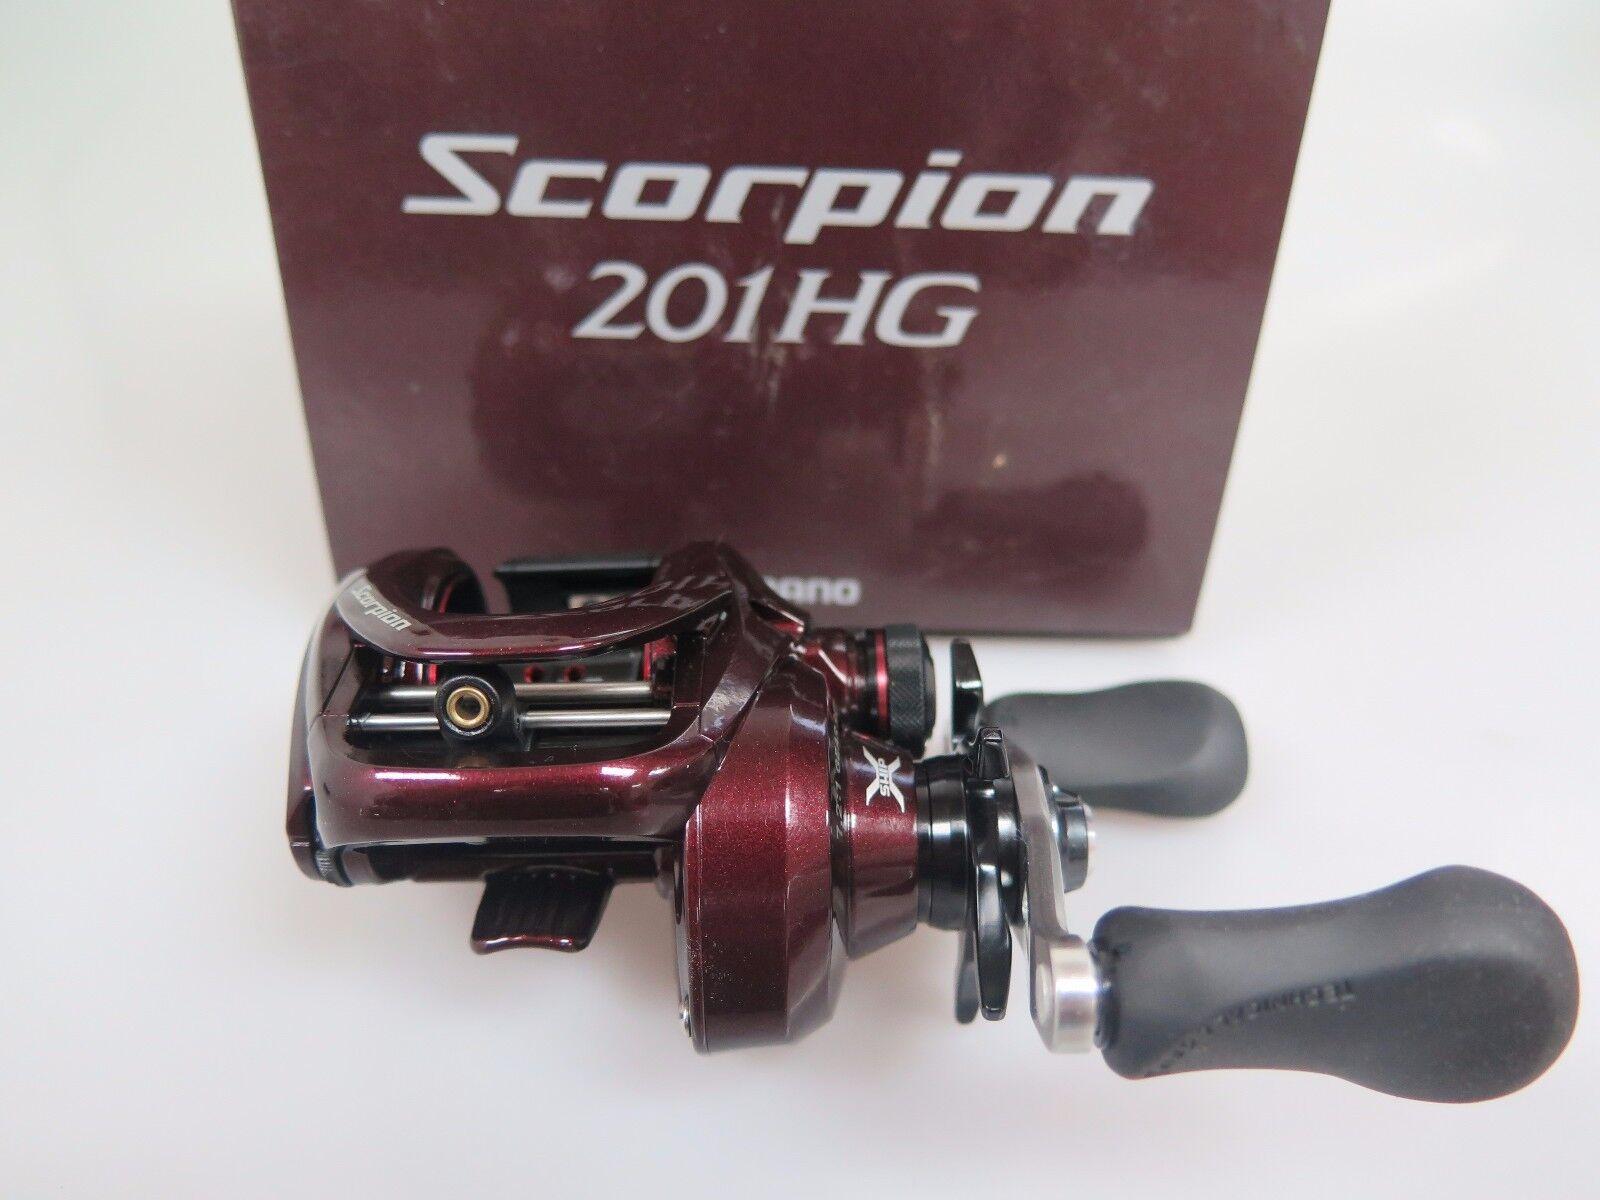 SHIuomoO Scorpion 201HG Left Baitcasting Reel 201 HG Fedex Priority 2days to Usa